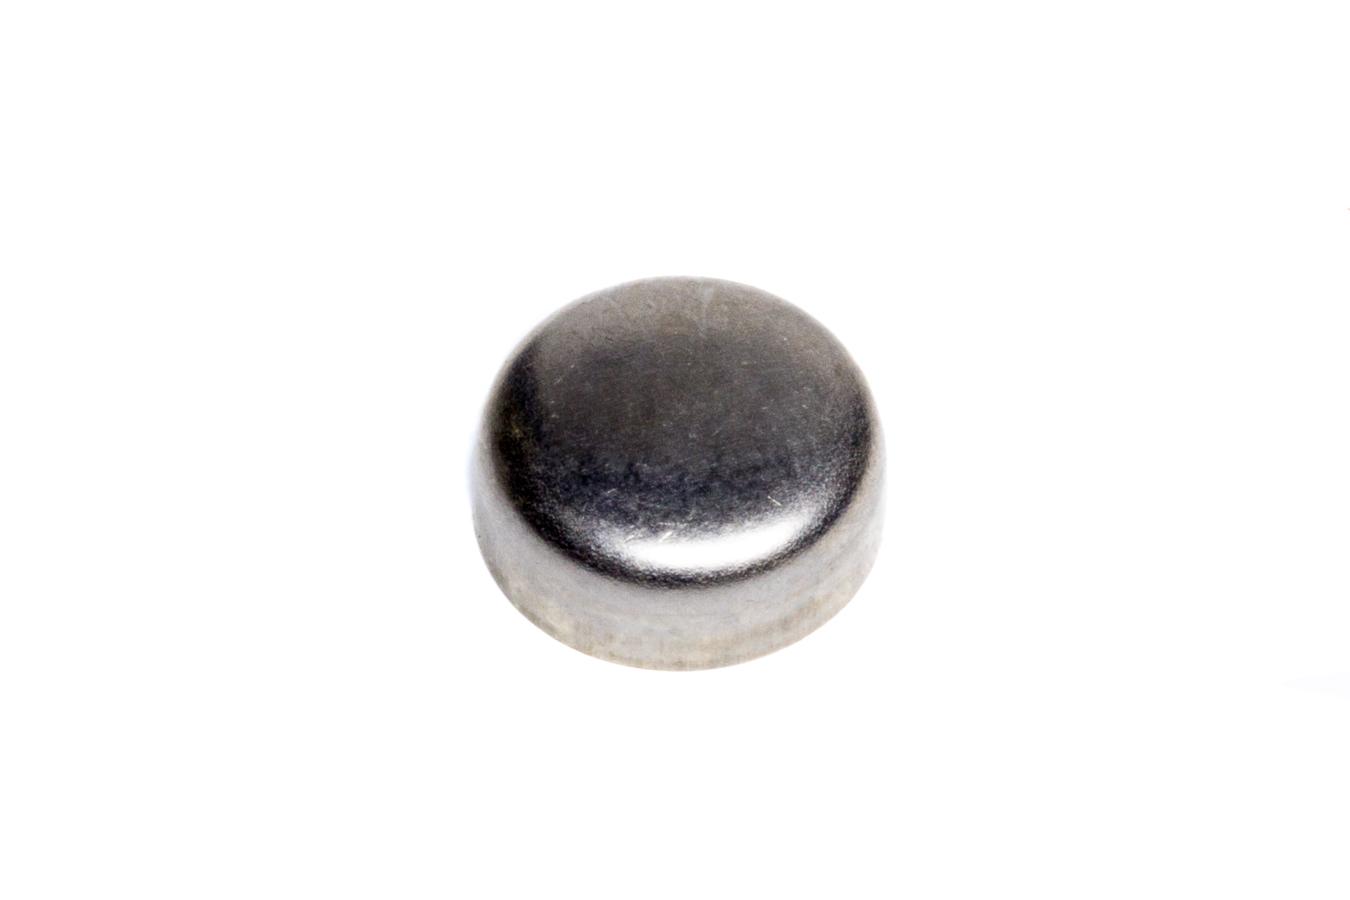 CHEVROLET PERFORMANCE Brass Plug - Block Core Hole